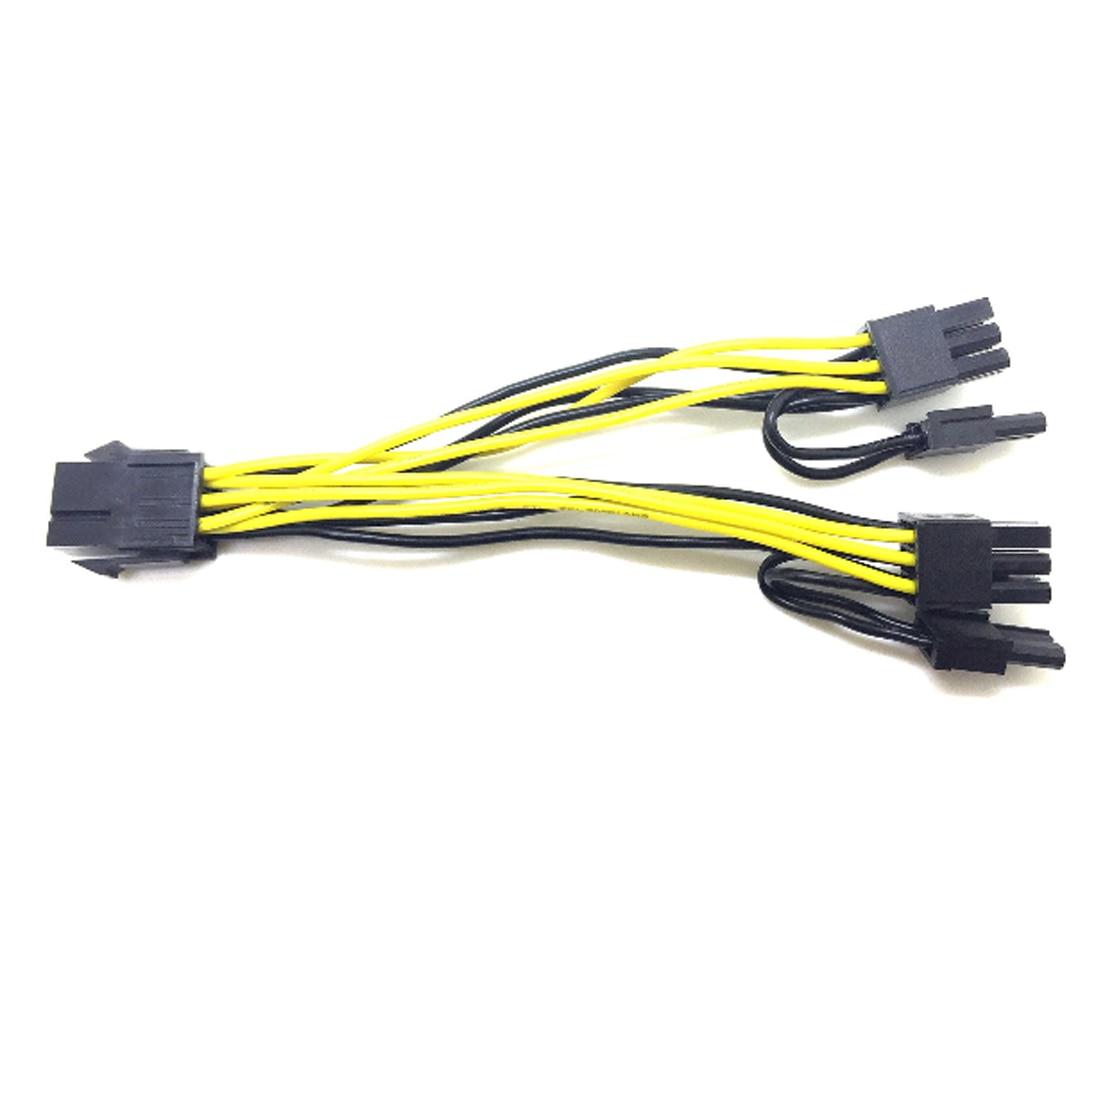 electrical wire hub data wiring diagram blog marsnaska 6 pin pci express to 2 x pcie 8 6 2 pin motherboard electrical wire harness electrical wire hub